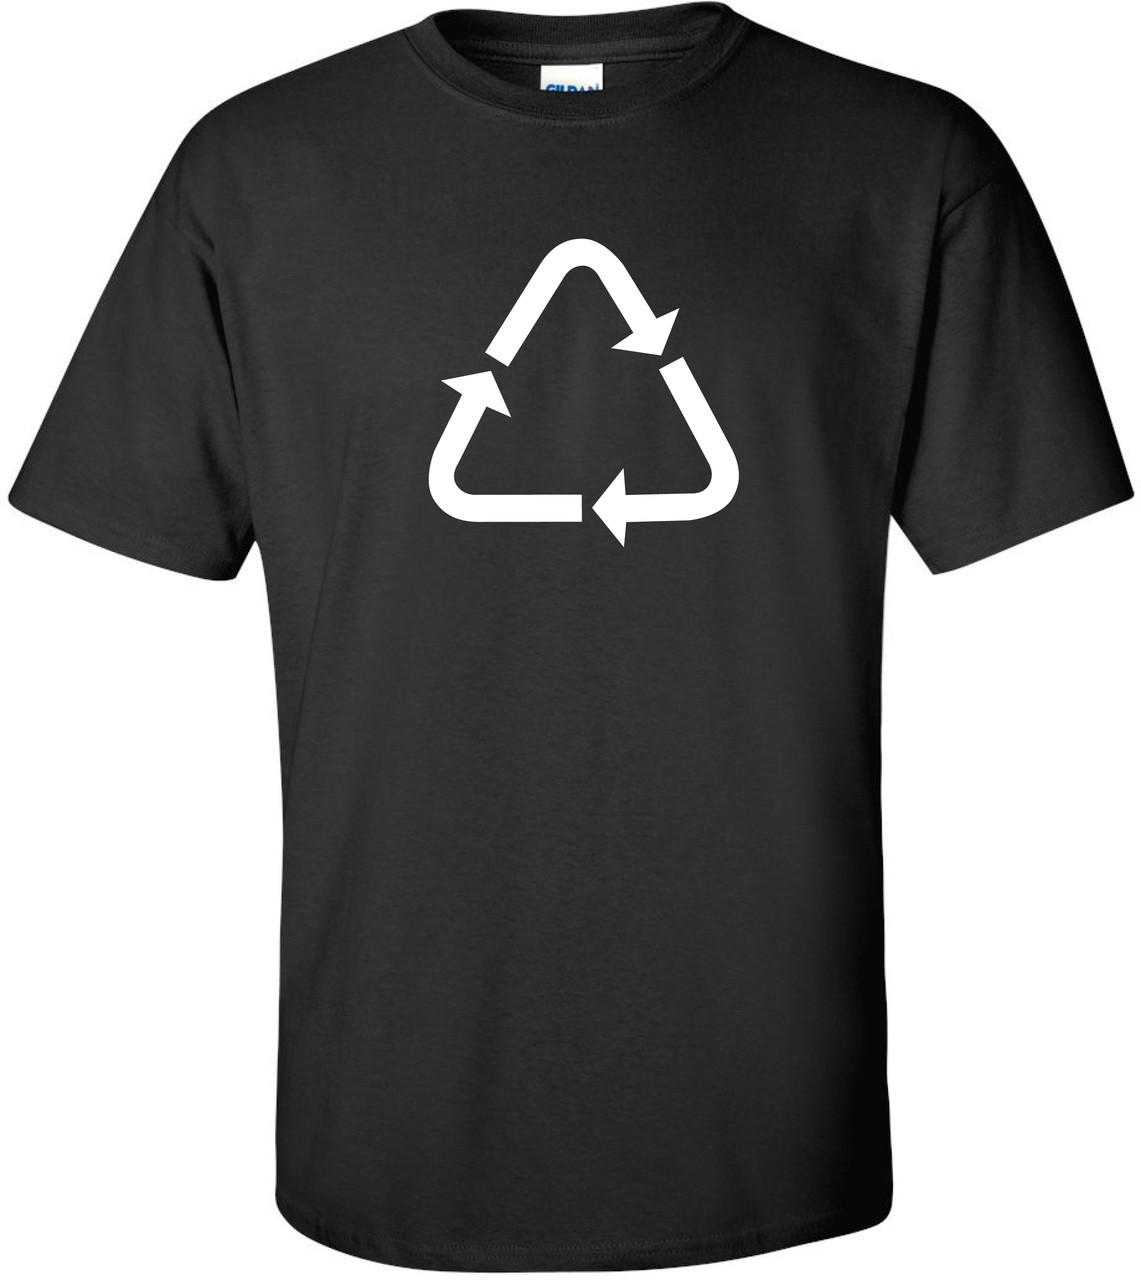 Recycle Triangle Symbol Sleek Logo T Shirt Interspace180